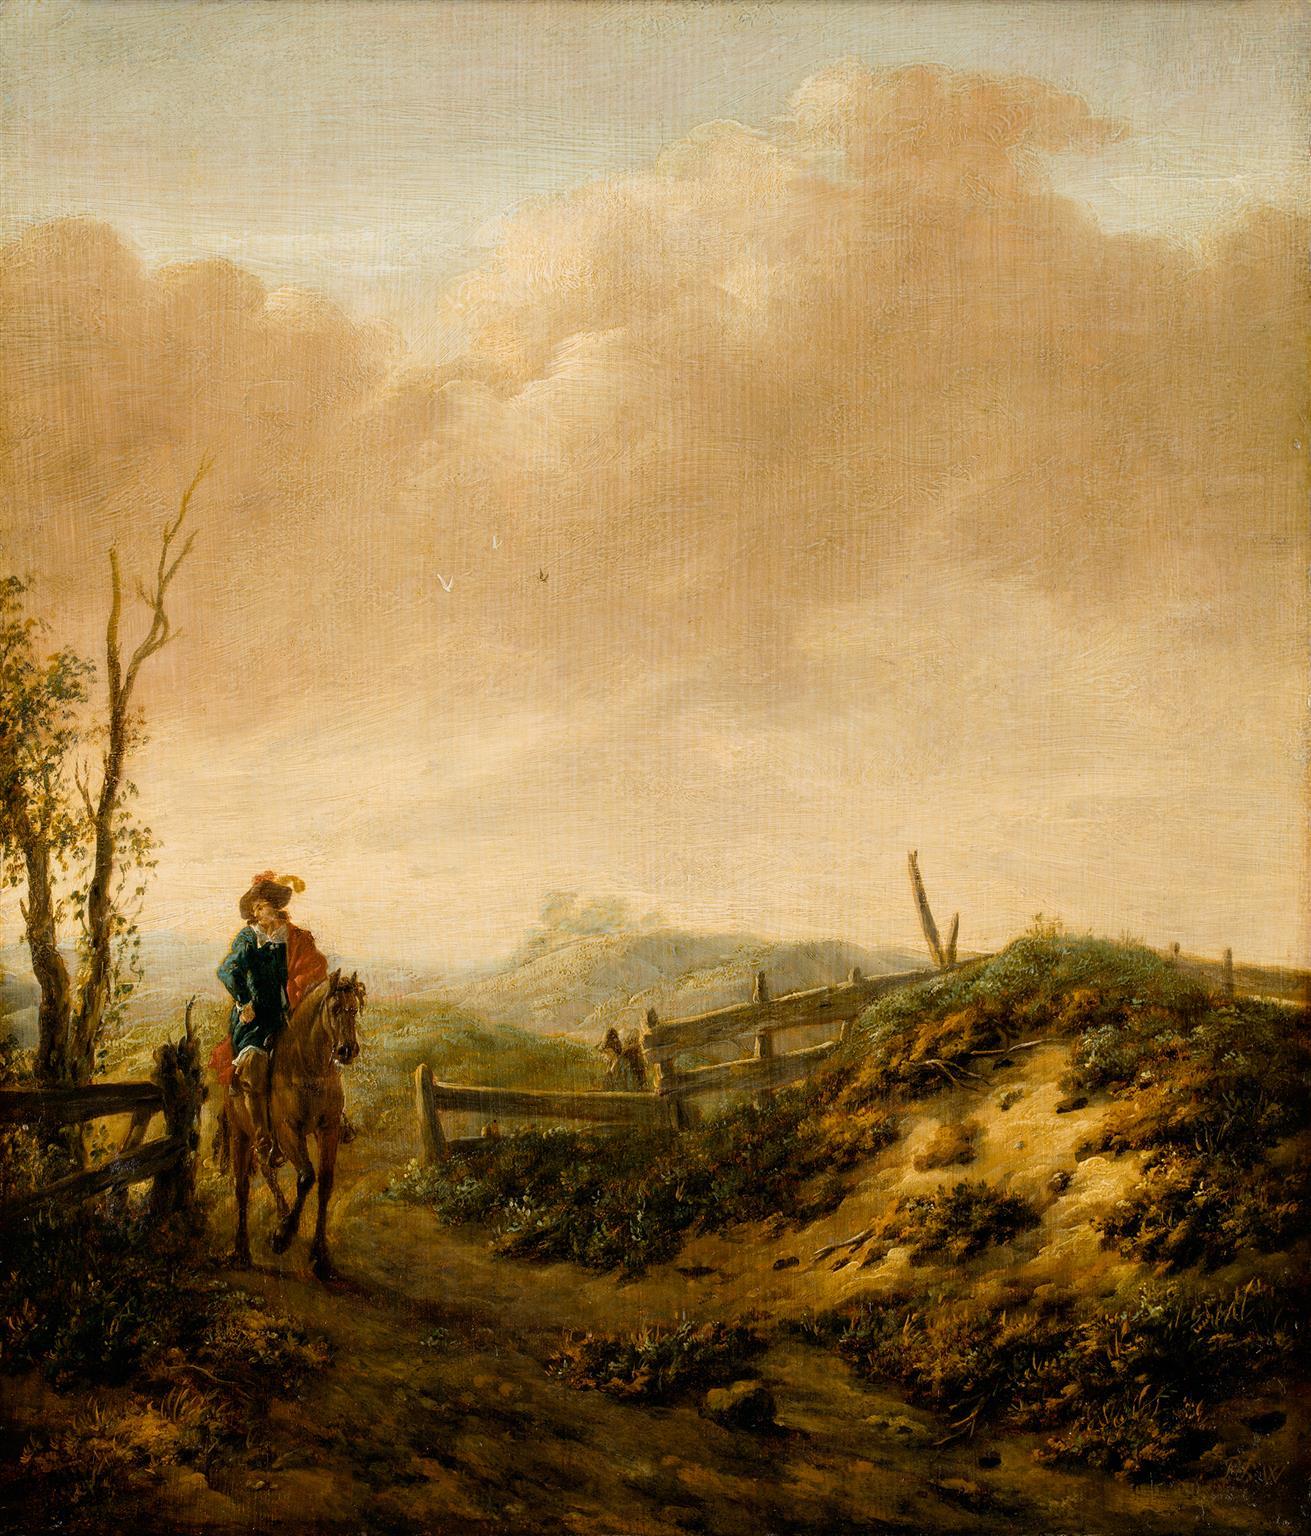 Philips Wouwerman (1619 - 1668), Dünenlandschaft mit Reiter, © Hamburger Kunsthalle / bpk,  Foto: Christoph Irrgang